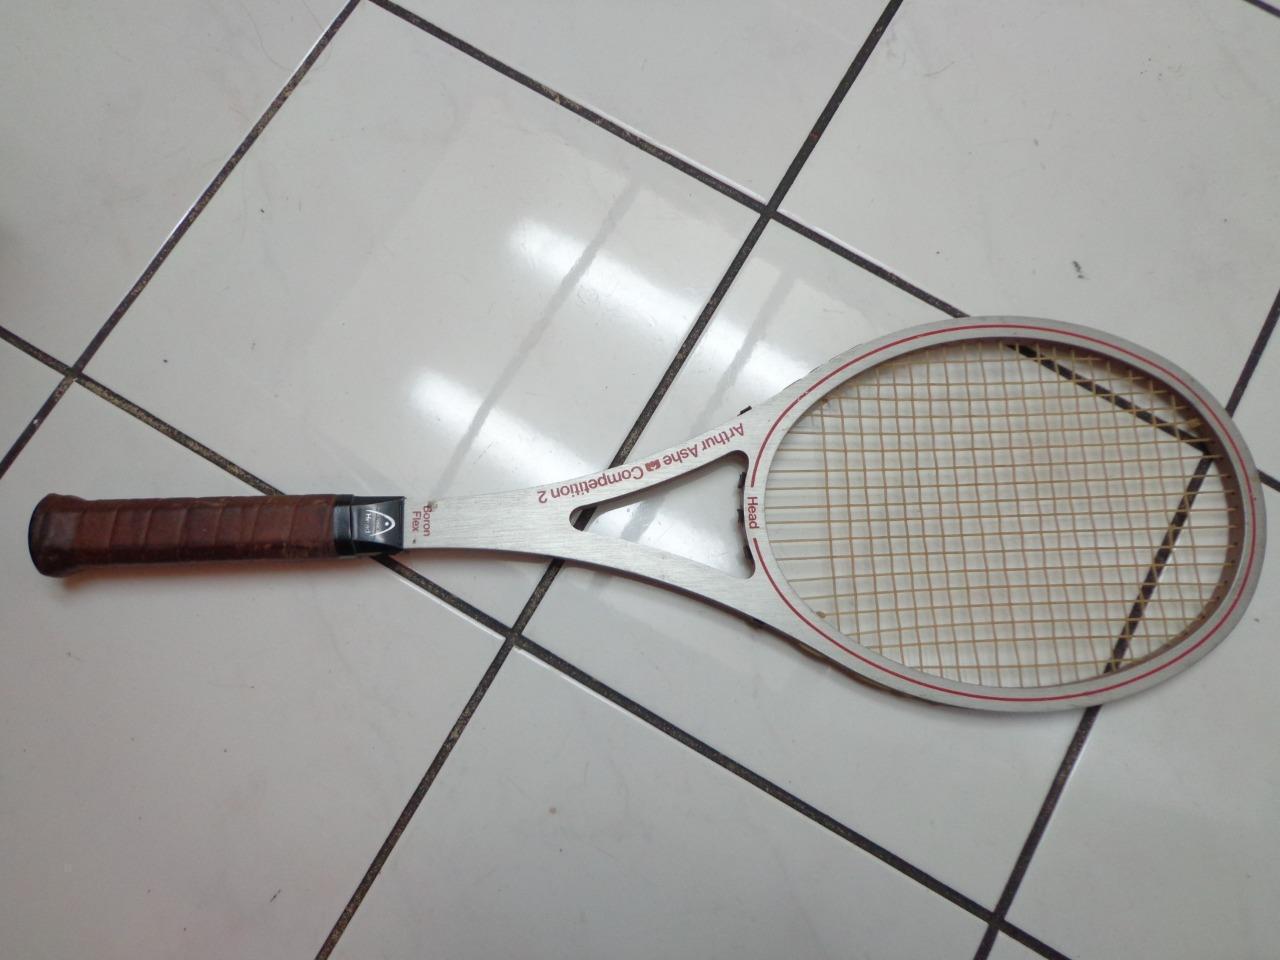 Head Arthur Ashe Competition 2 Mi 4 5 8 grip raquette de tennis